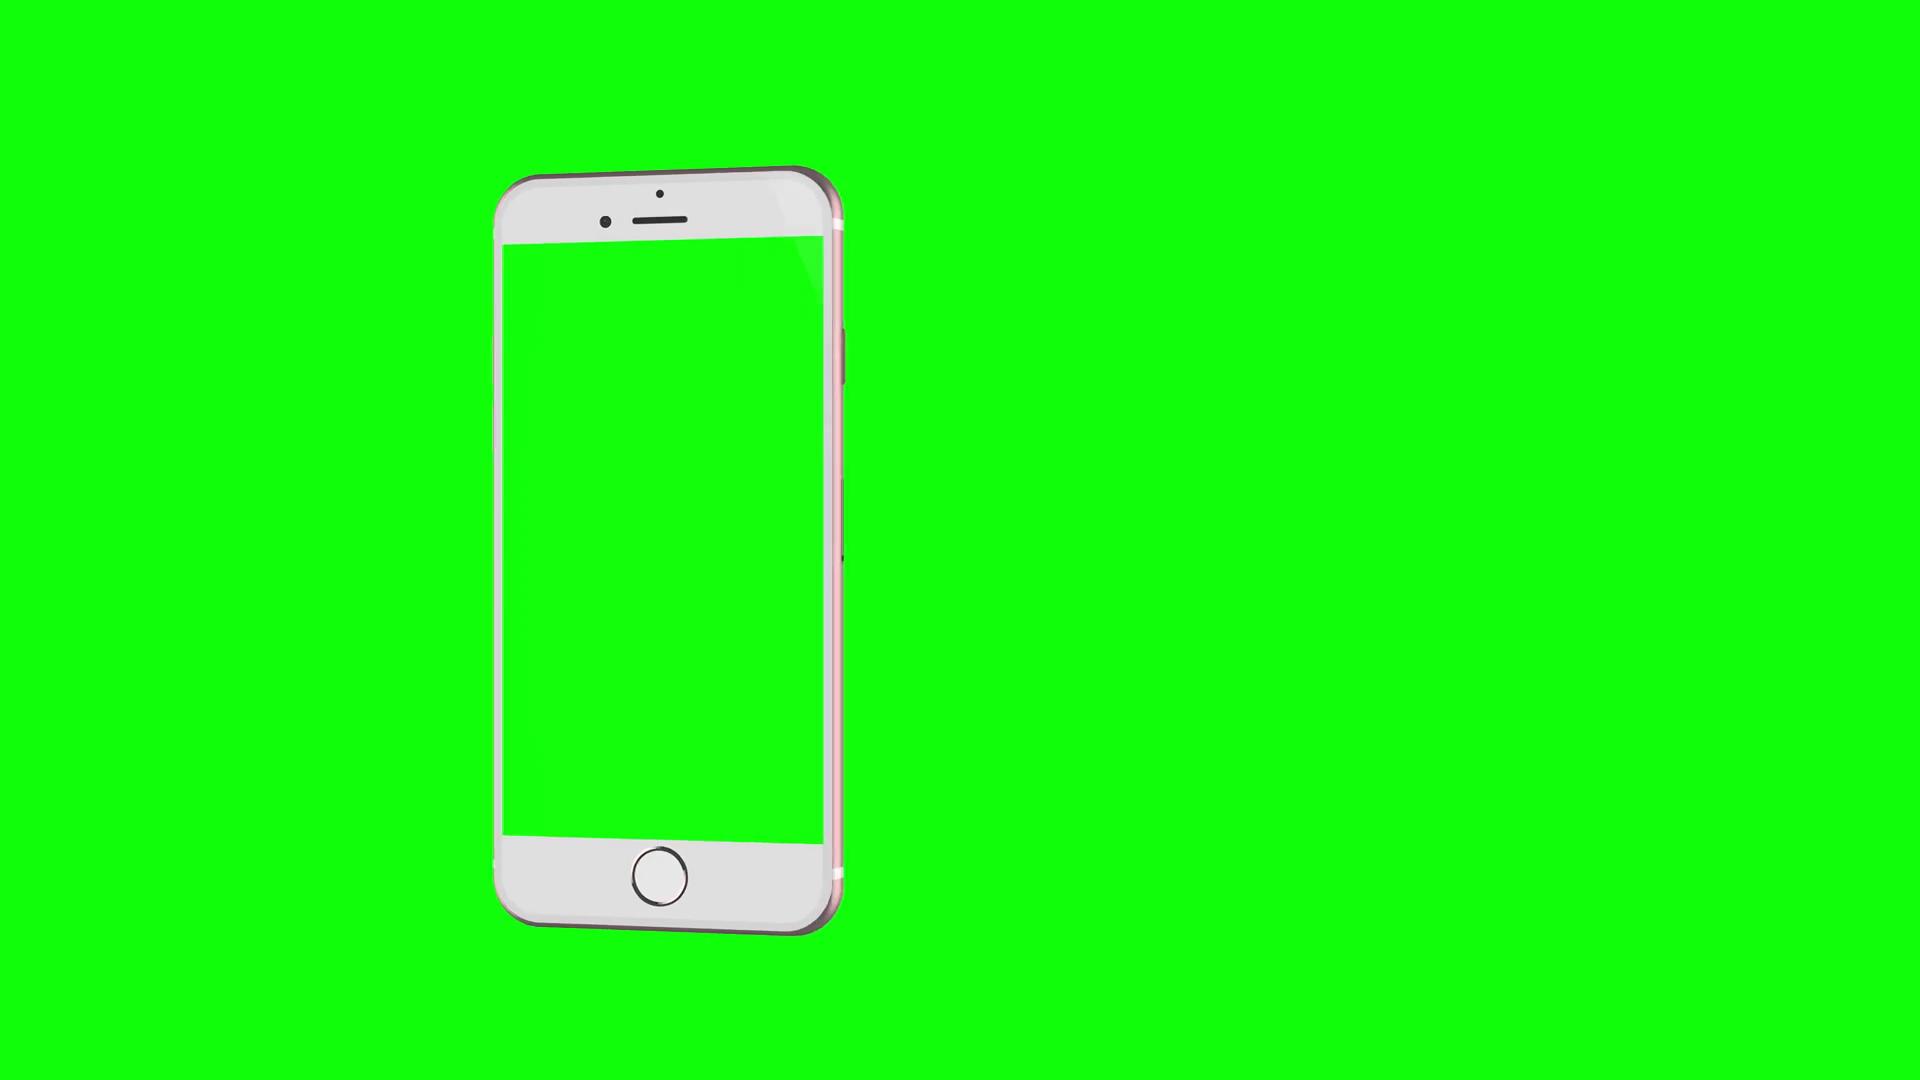 Green Screen Png.